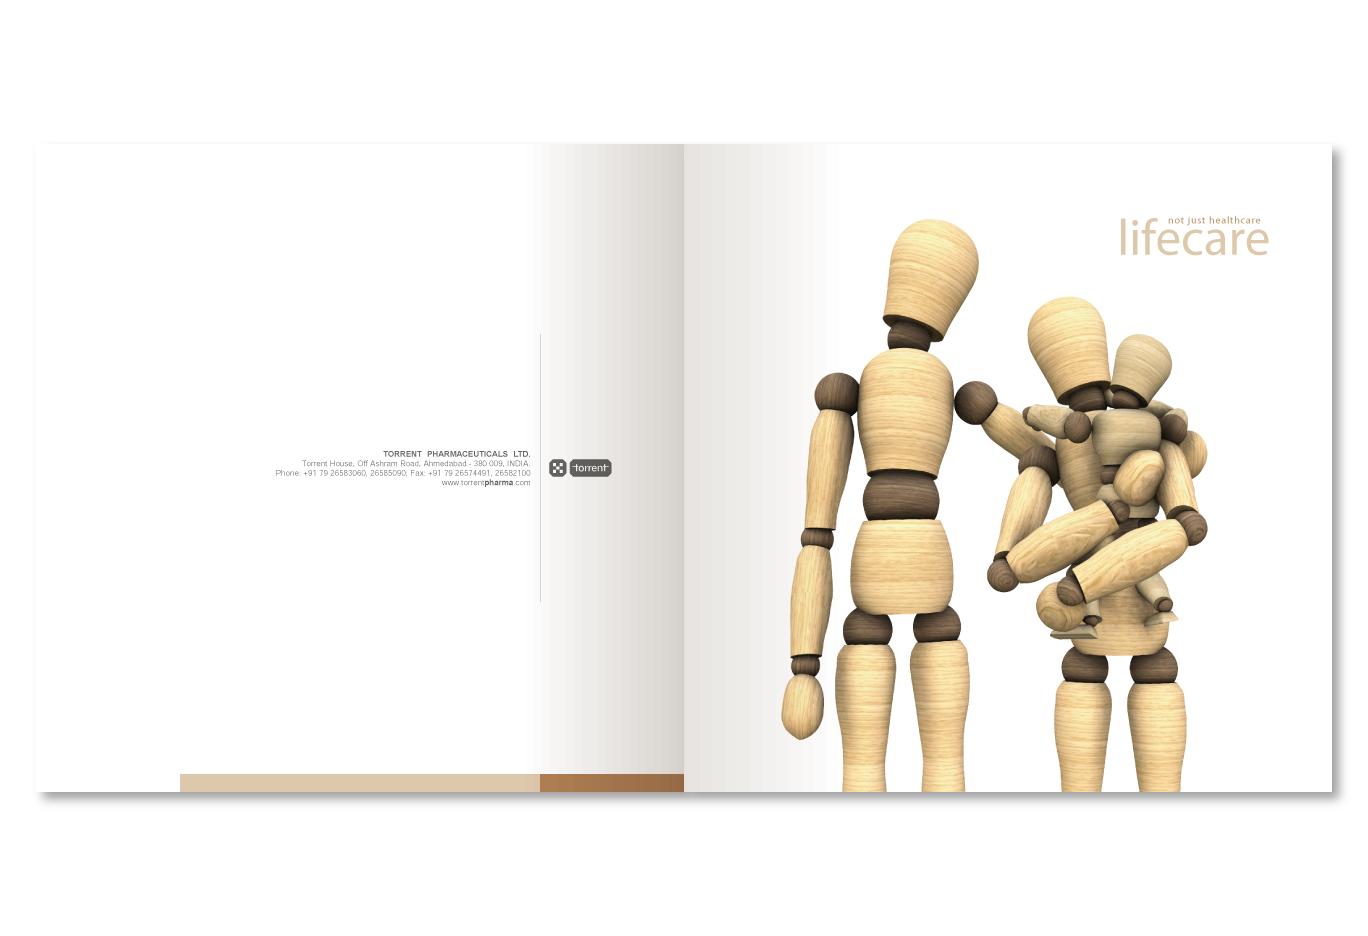 Brochure book design by sudhir kuduchkar at coroflot com